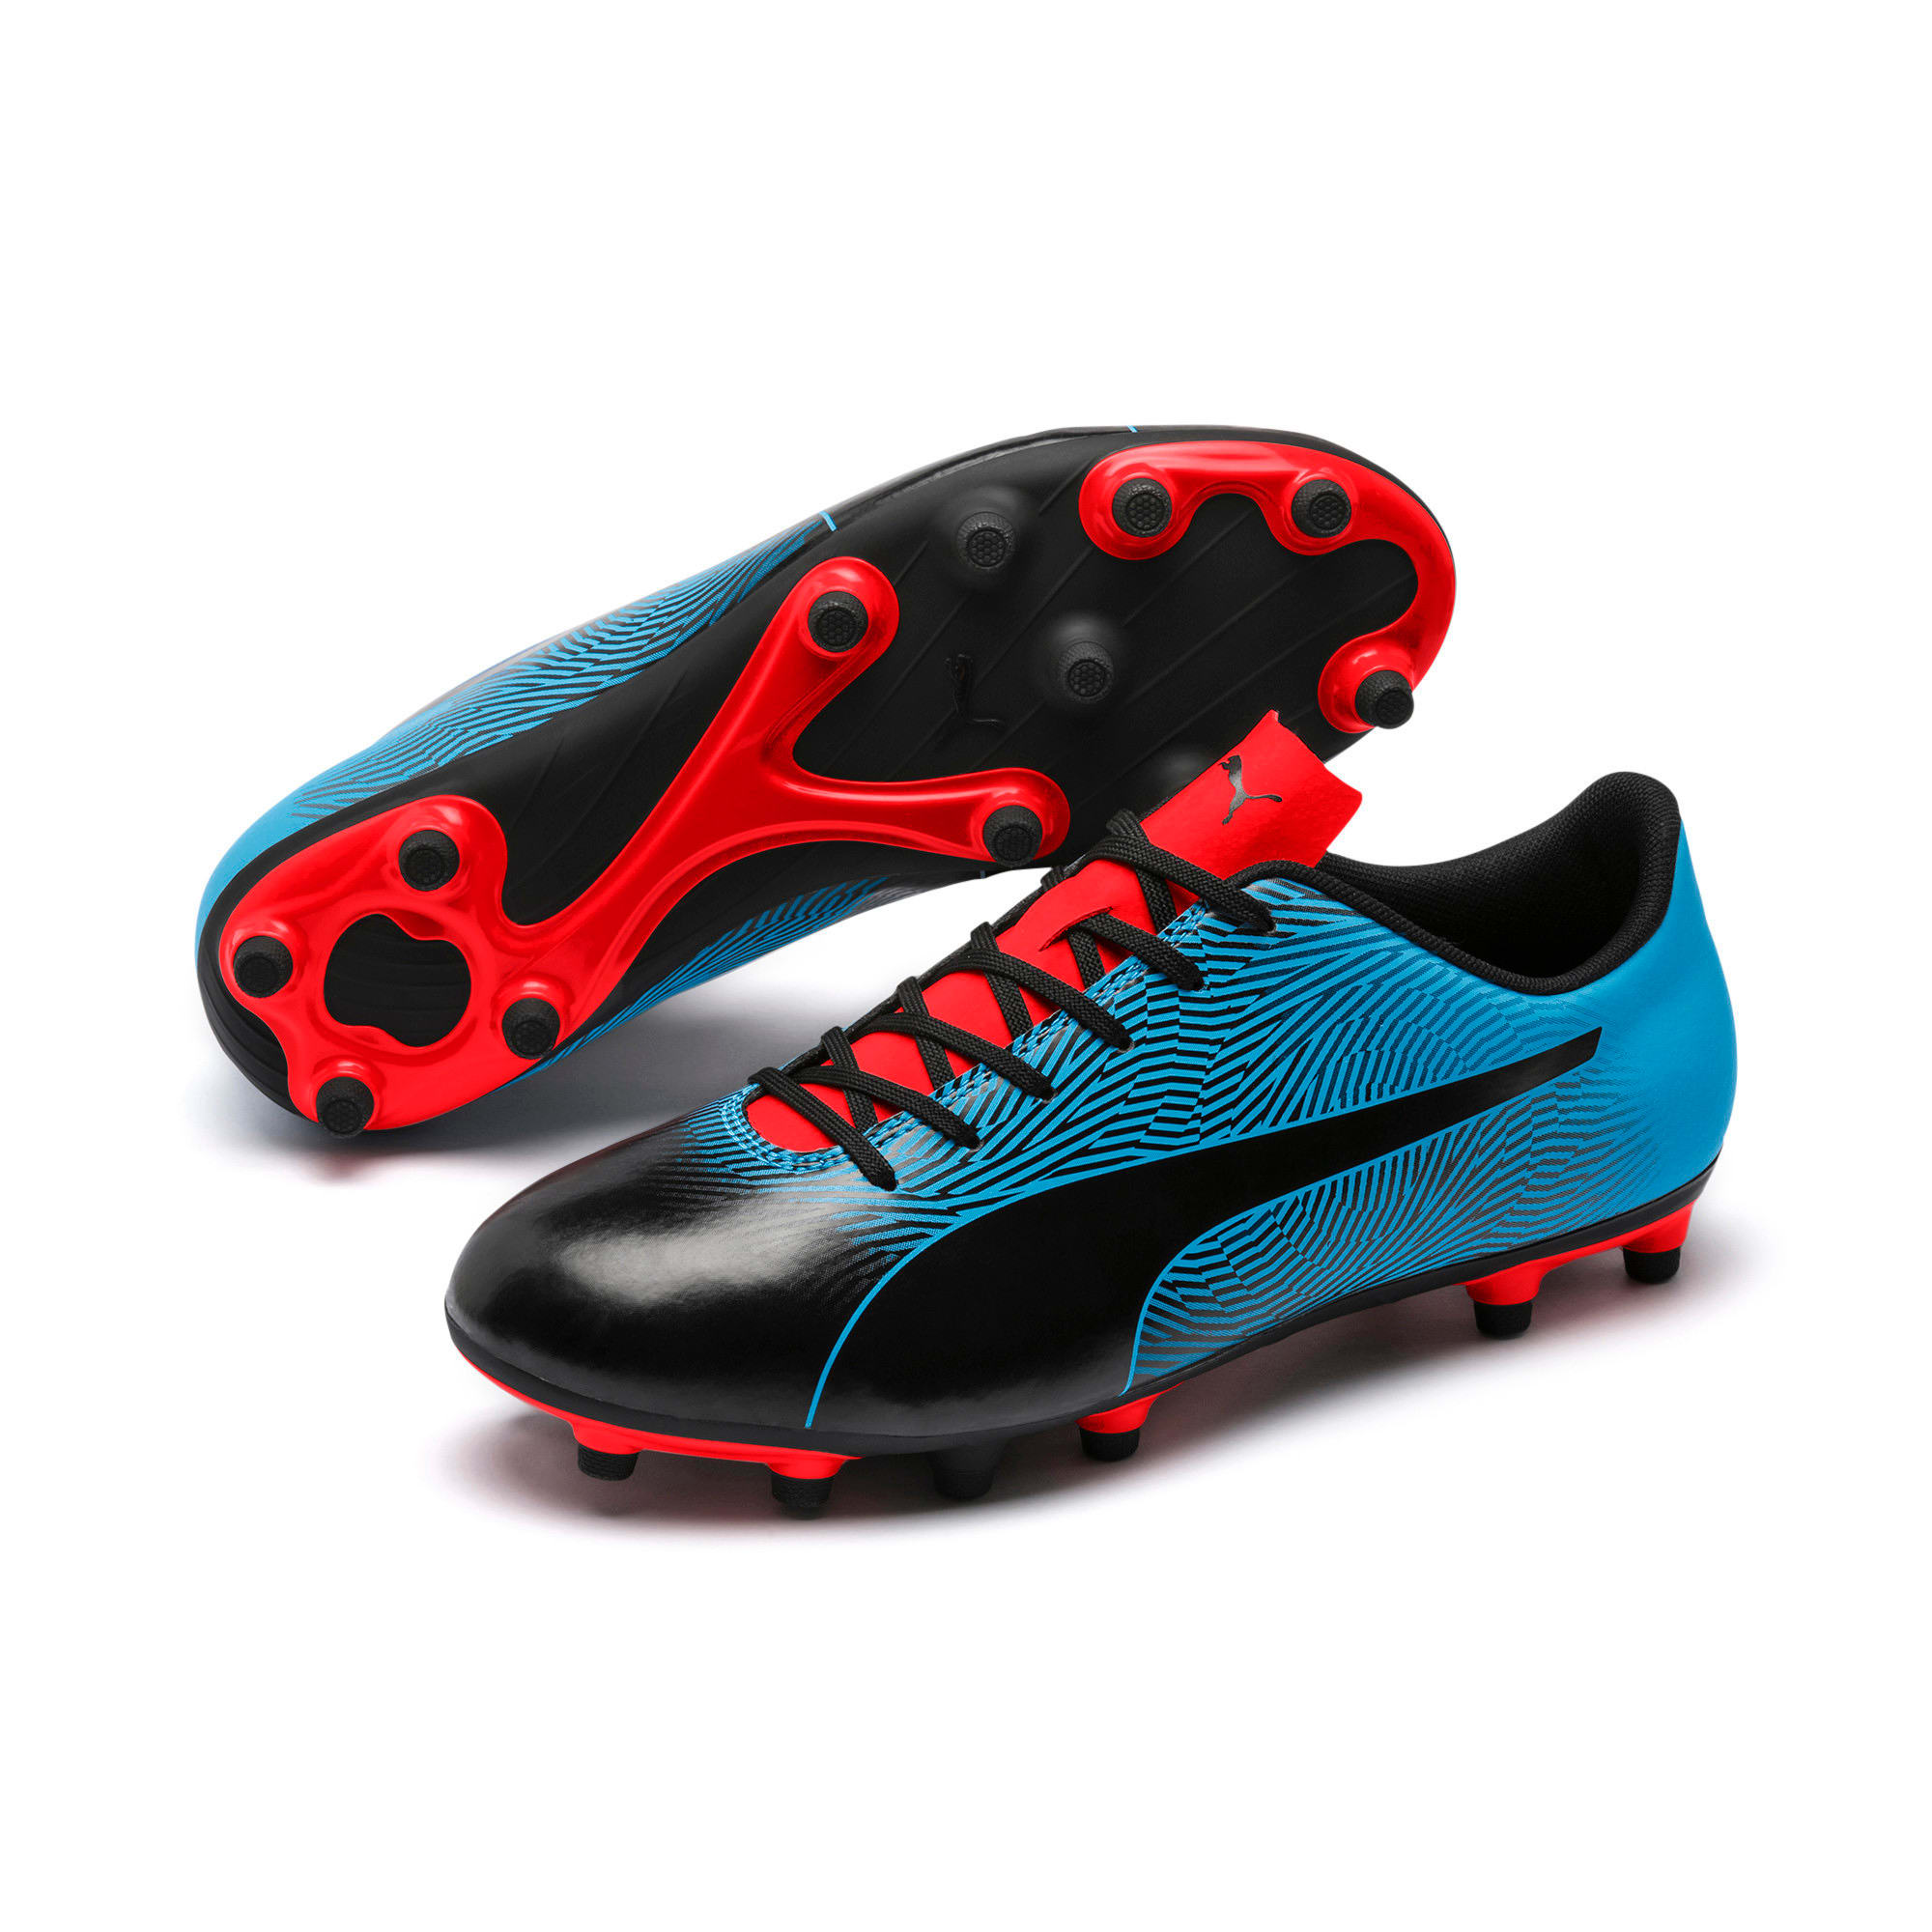 Miniatura 2 de Botines de fútbol PUMA Spirit II FG para hombre, Black-Bleu Azur-Red Blast, mediano